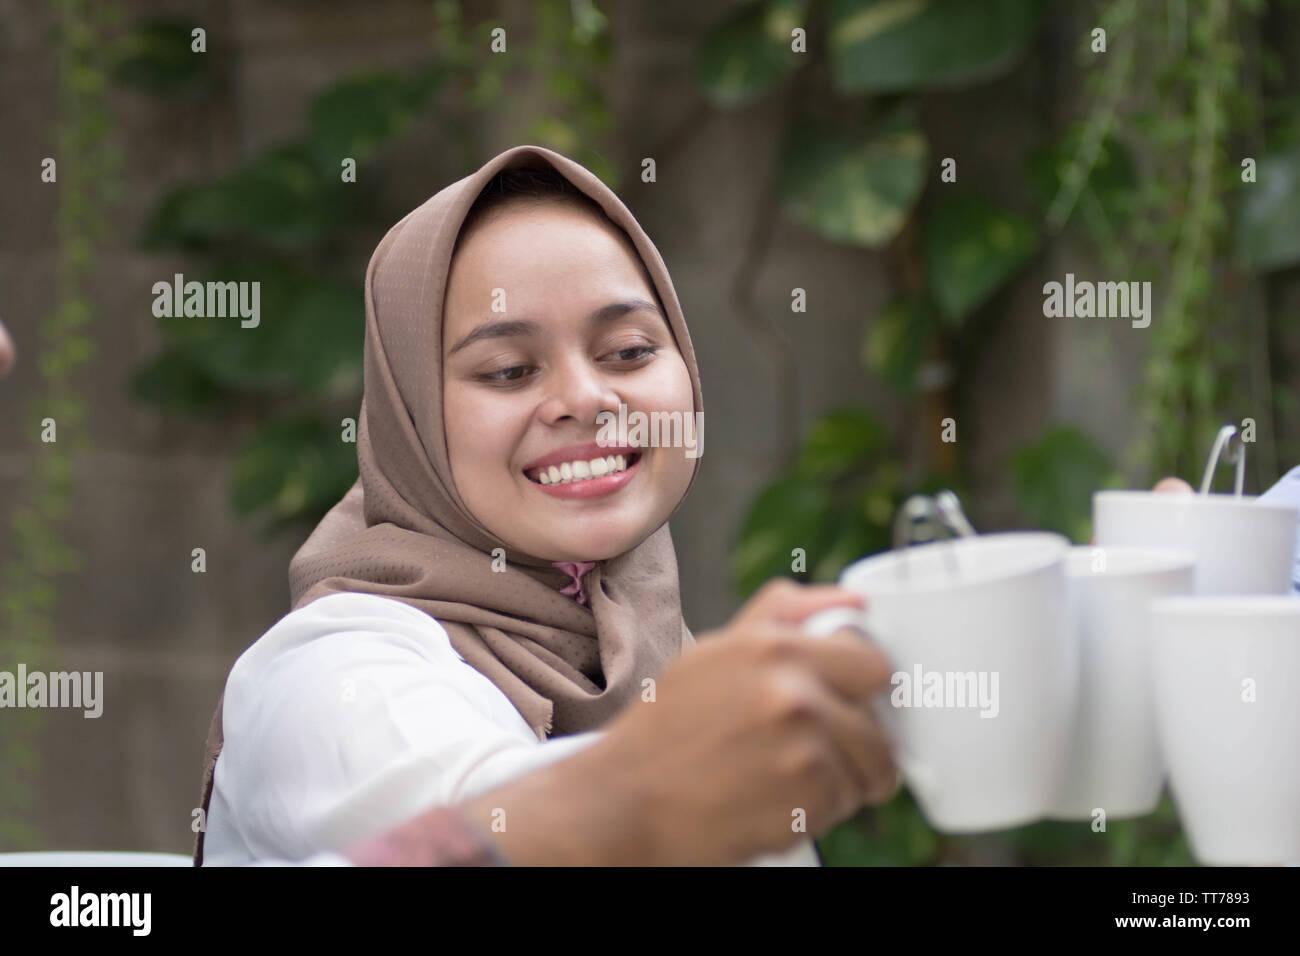 Mia khalifa mengungkapkan dampak keputusannya terjun di industri film porno terhadap kehidupannya di program talk show bbc, hardtalk. Muslim Women Tea High Resolution Stock Photography And Images Alamy